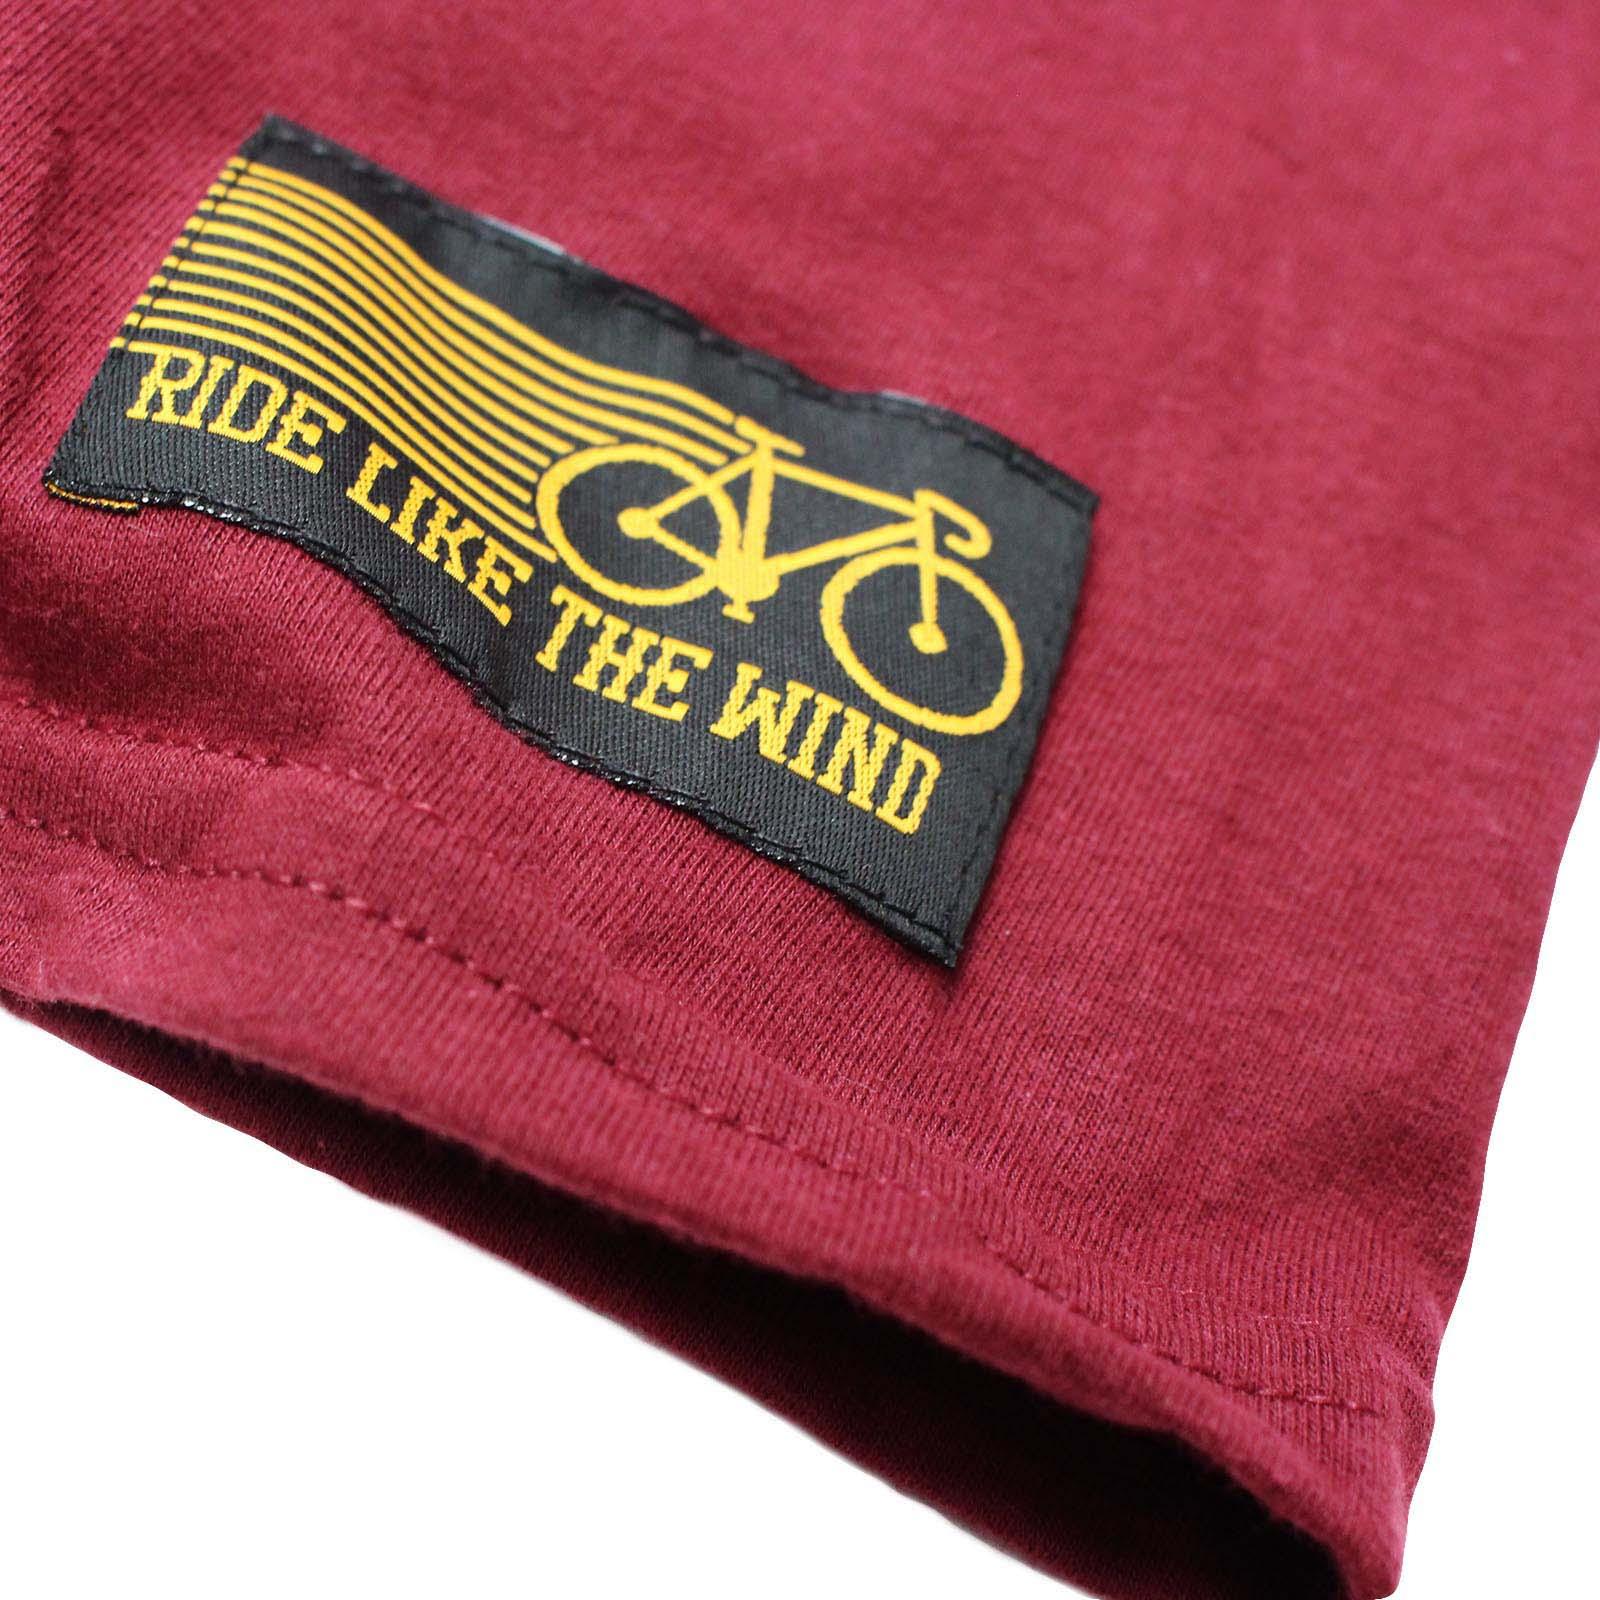 Cycling-T-Shirt-Funny-Novelty-Mens-tee-TShirt-Bike-Part-Words thumbnail 16